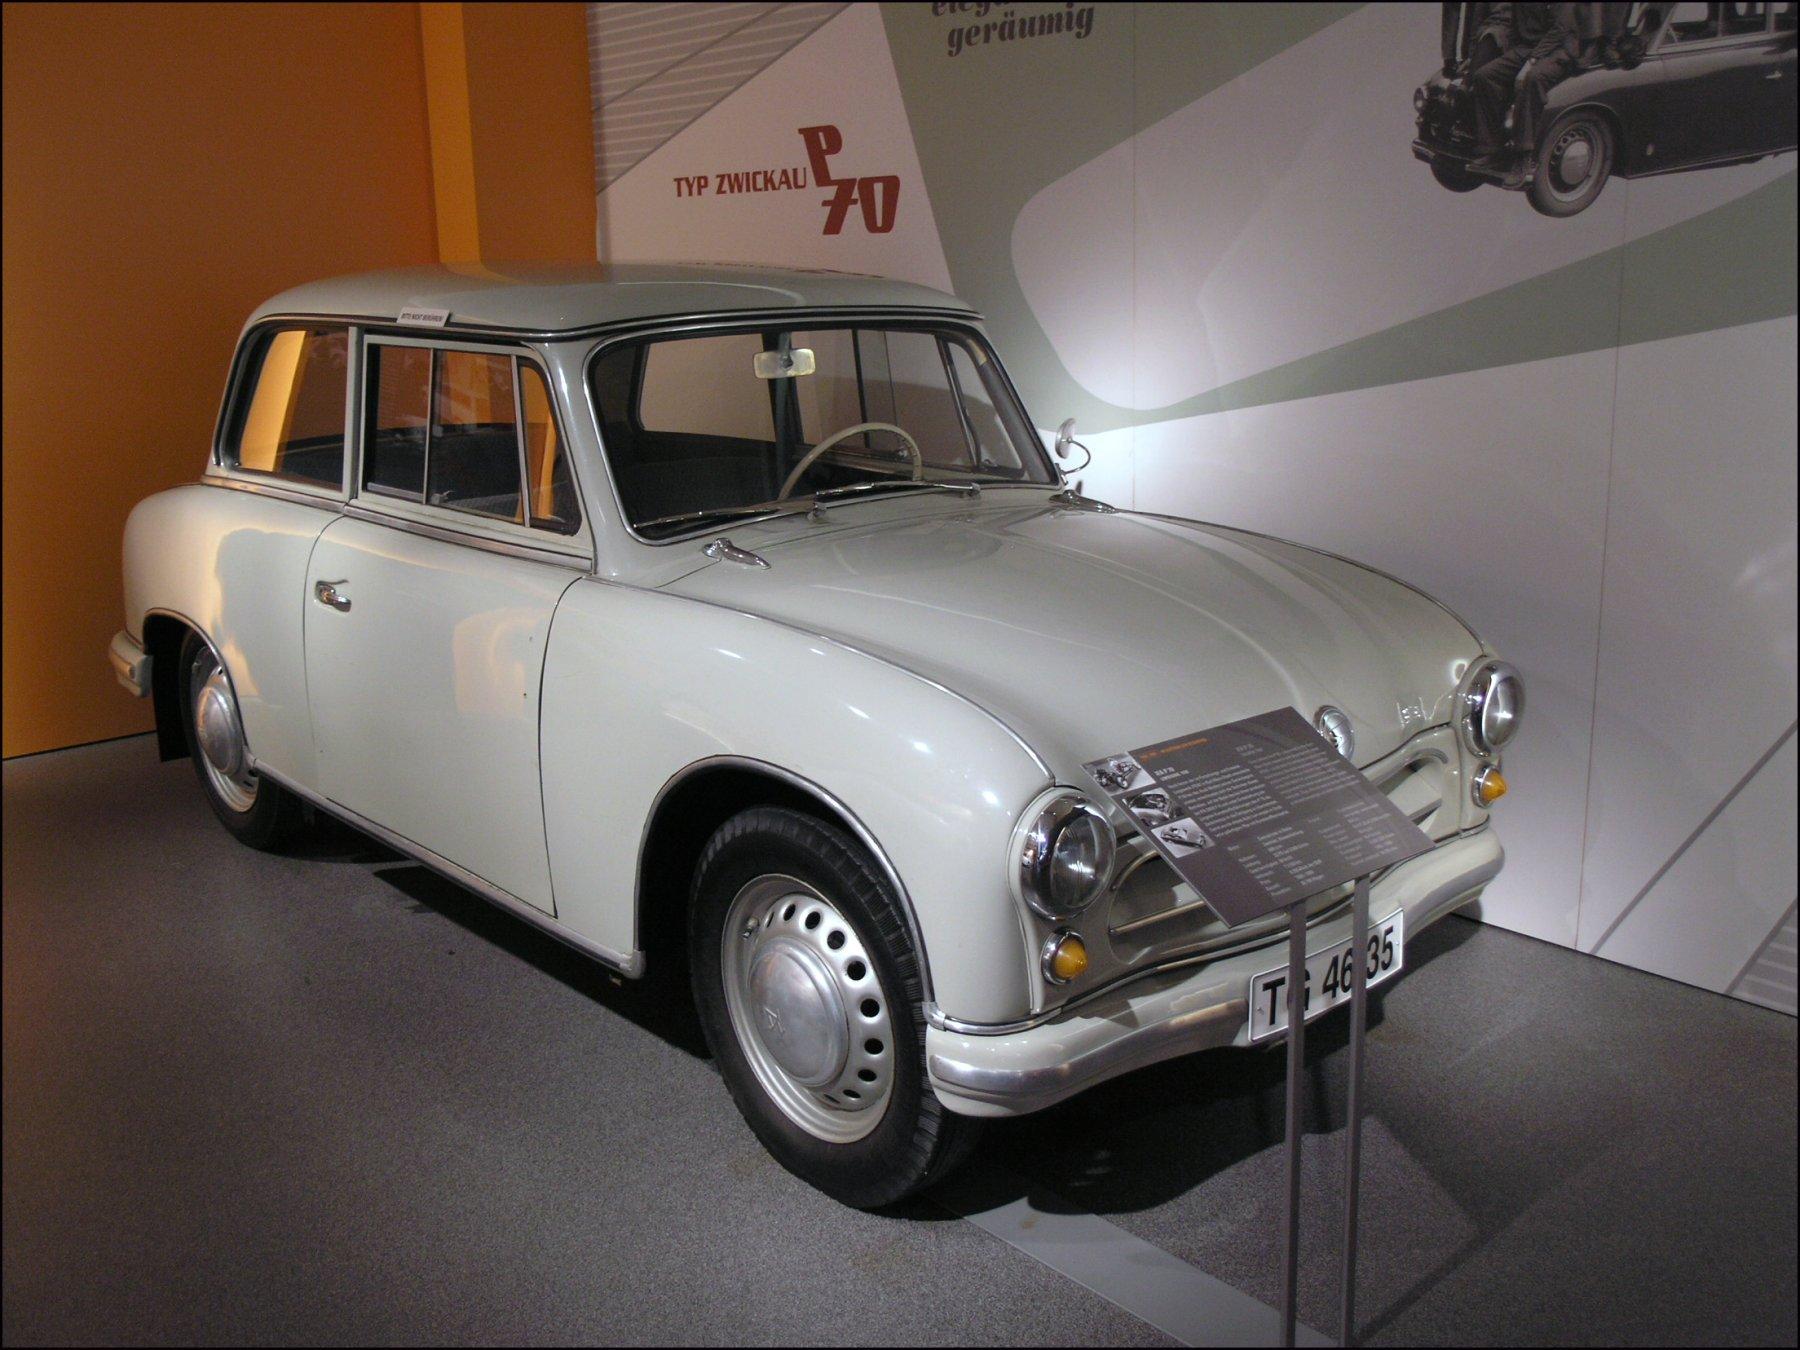 IFA_P_70_Limousine